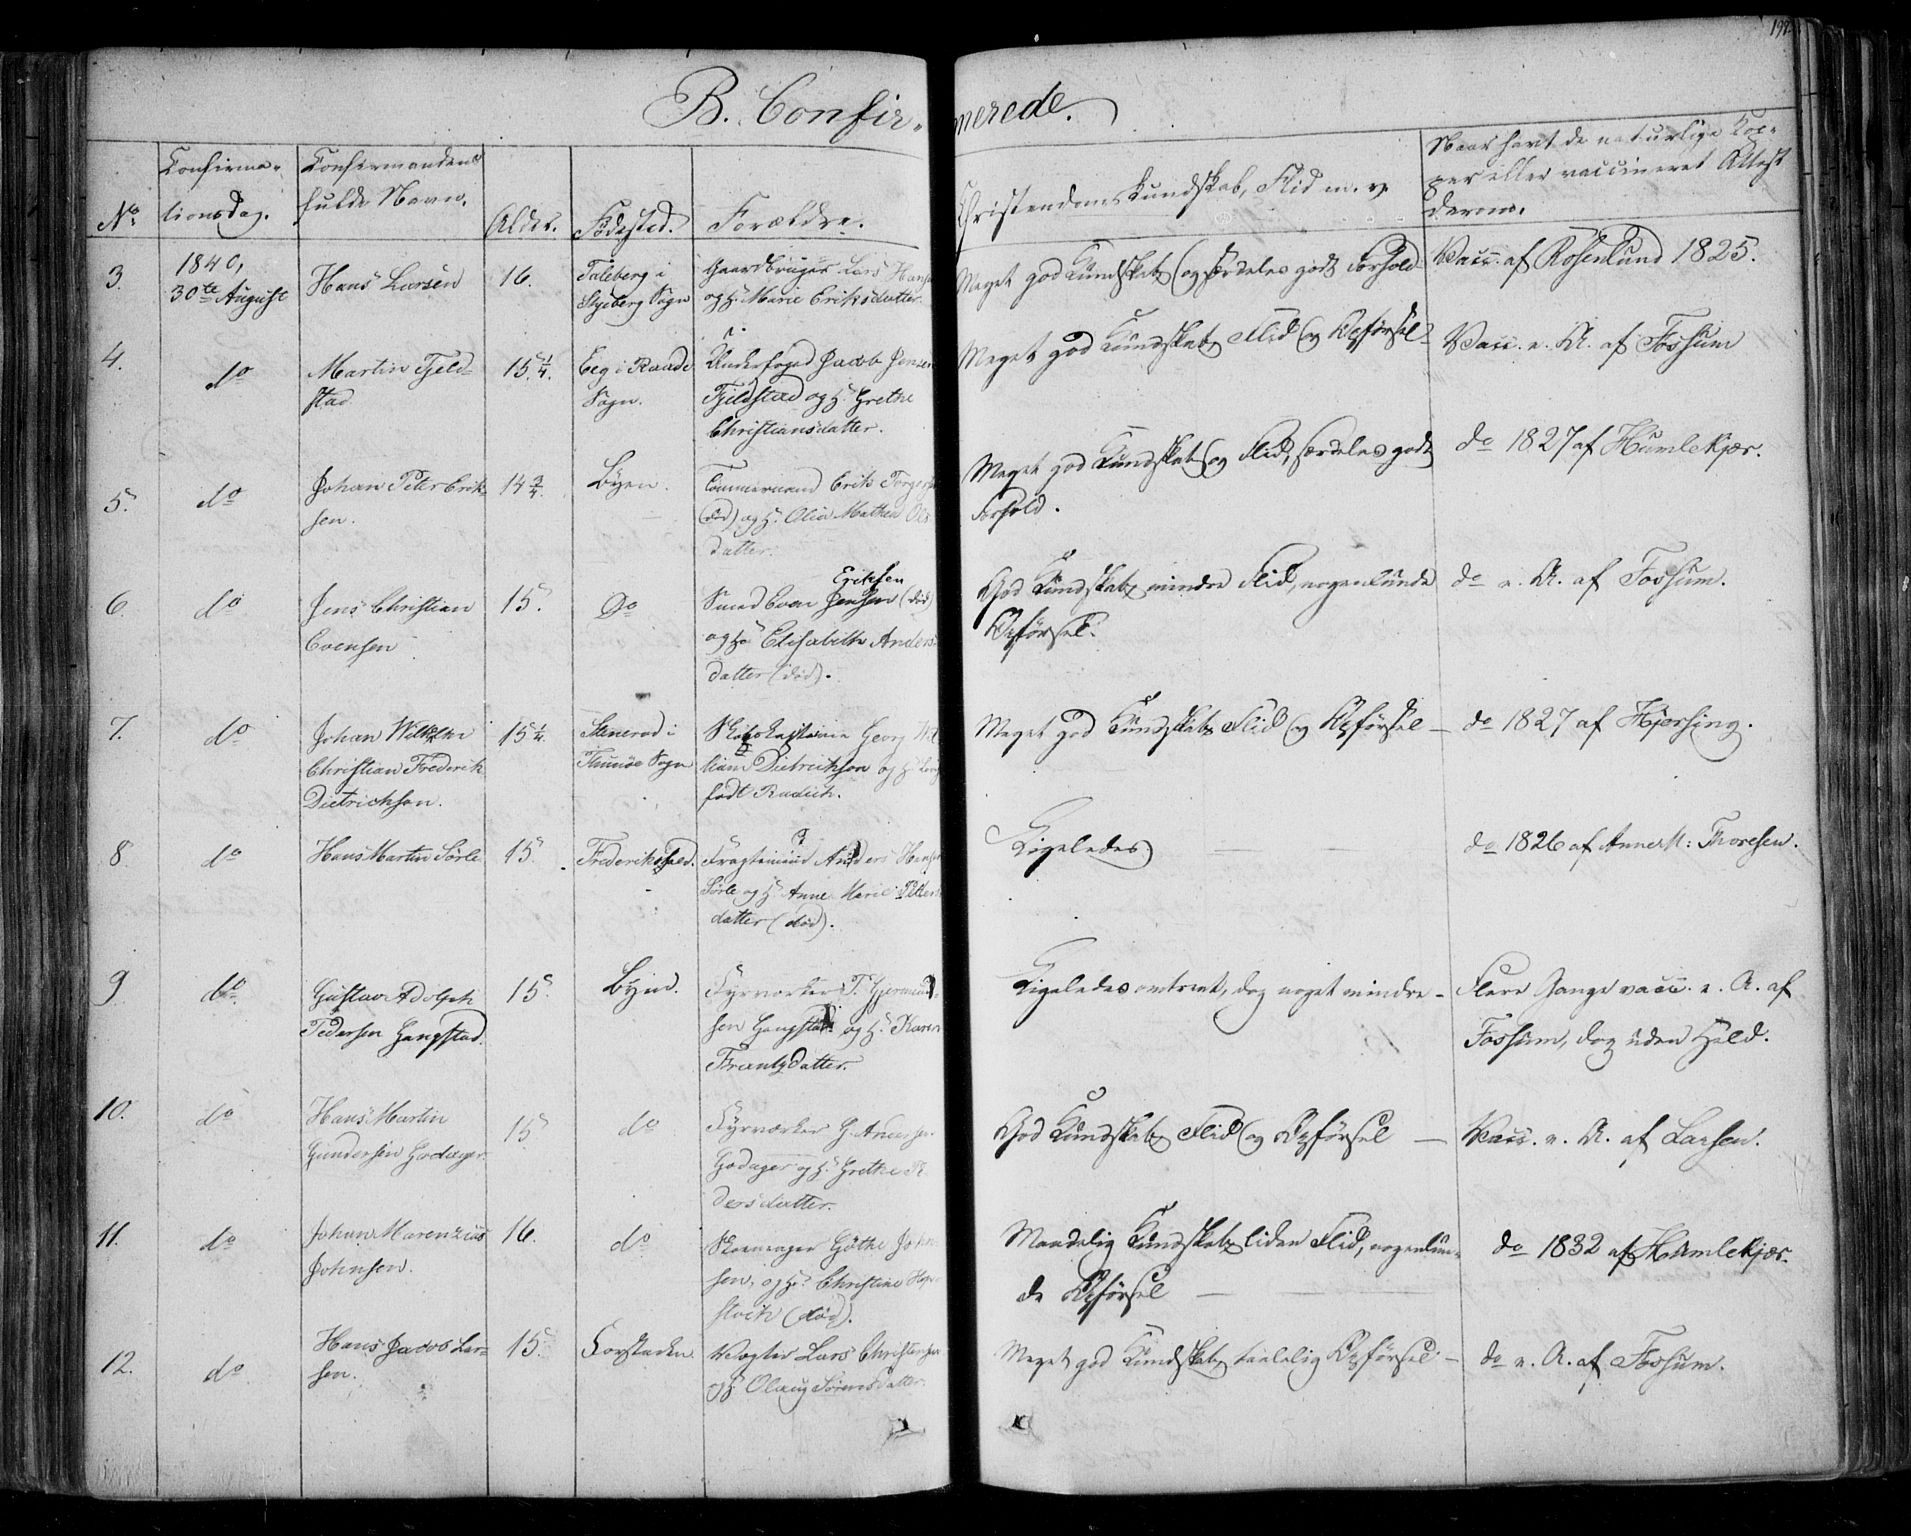 SAO, Fredrikstad prestekontor Kirkebøker, F/Fa/L0005: Ministerialbok nr. 5, 1835-1856, s. 197